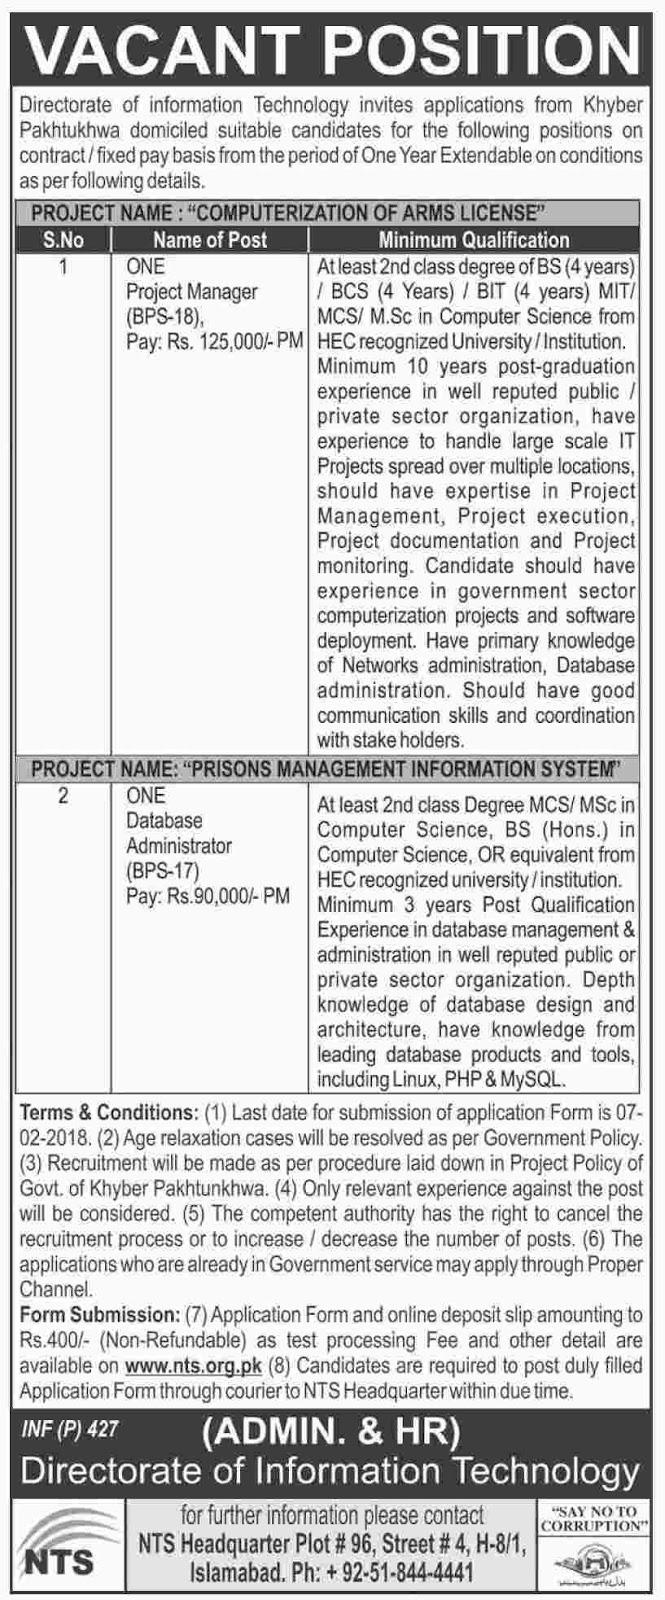 New NTS Jobs in KPK, Khyber Pakhtunkhwa Information Technology Board